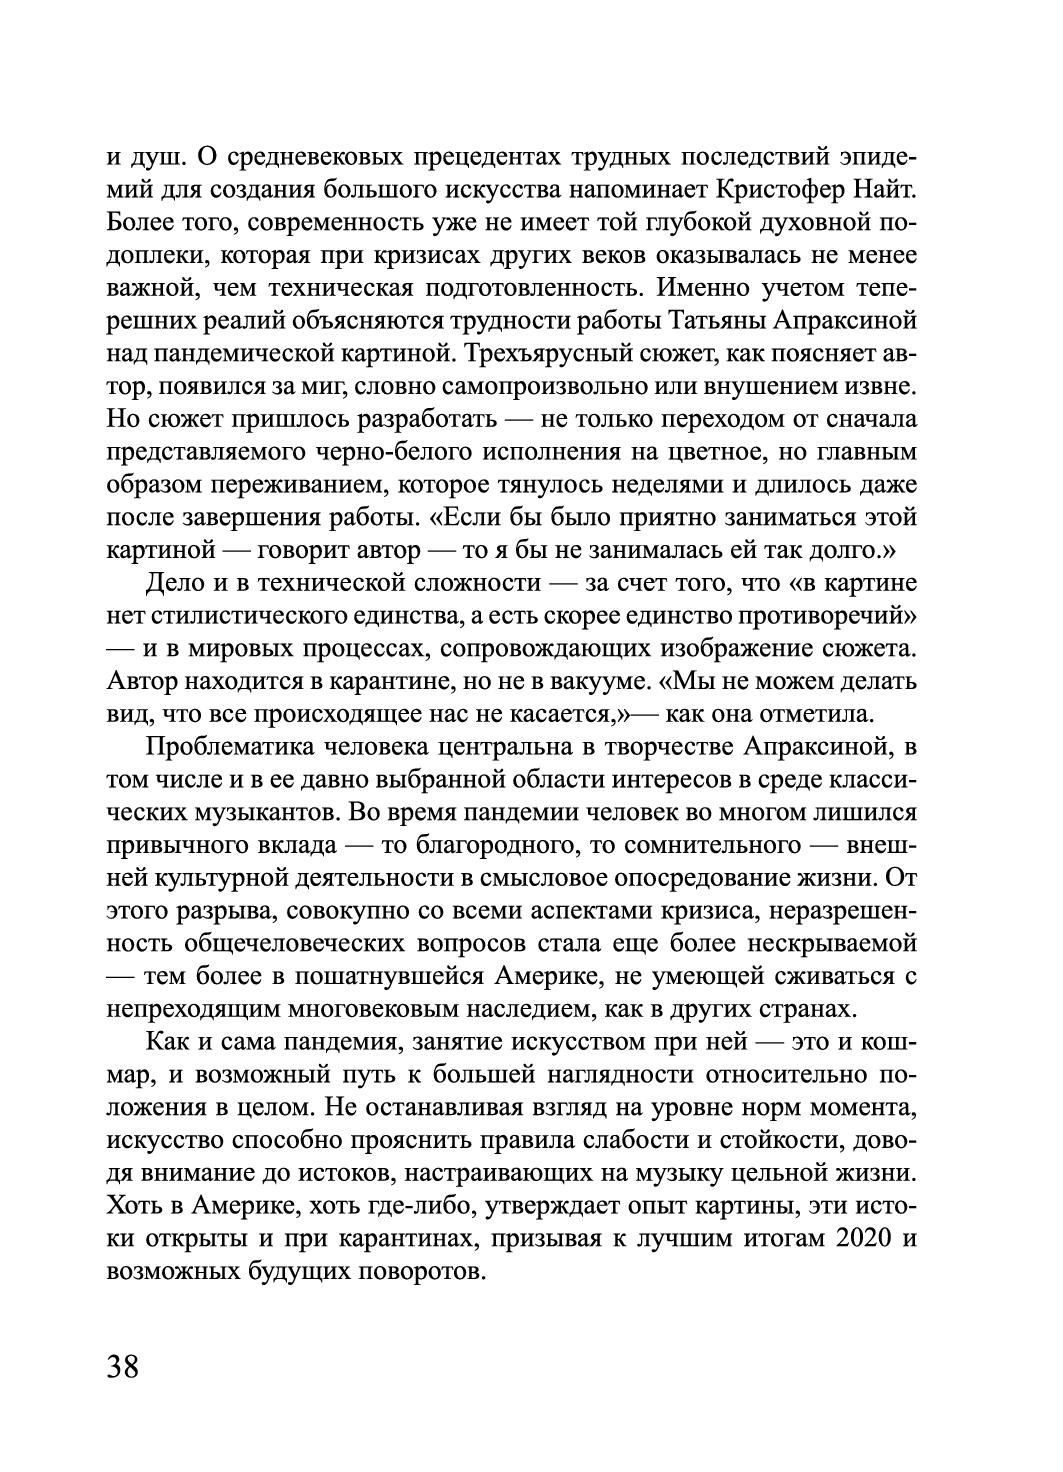 http://forumupload.ru/uploads/001a/7d/26/3/779905.jpg